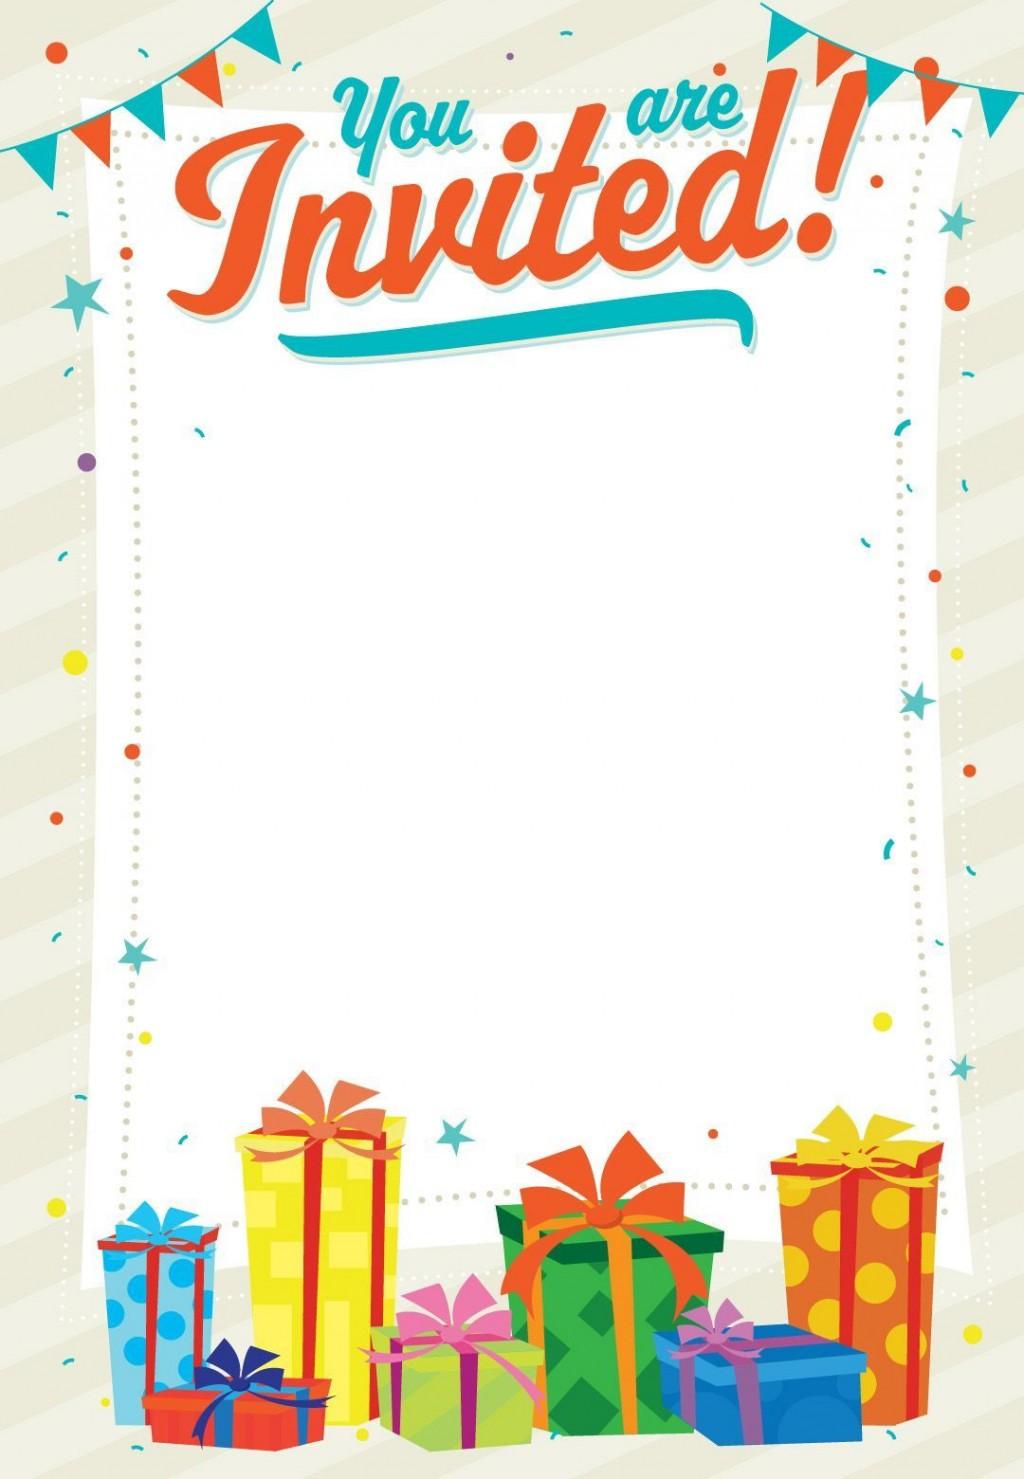 004 Singular Free Birthday Card Invitation Template Printable Picture Large